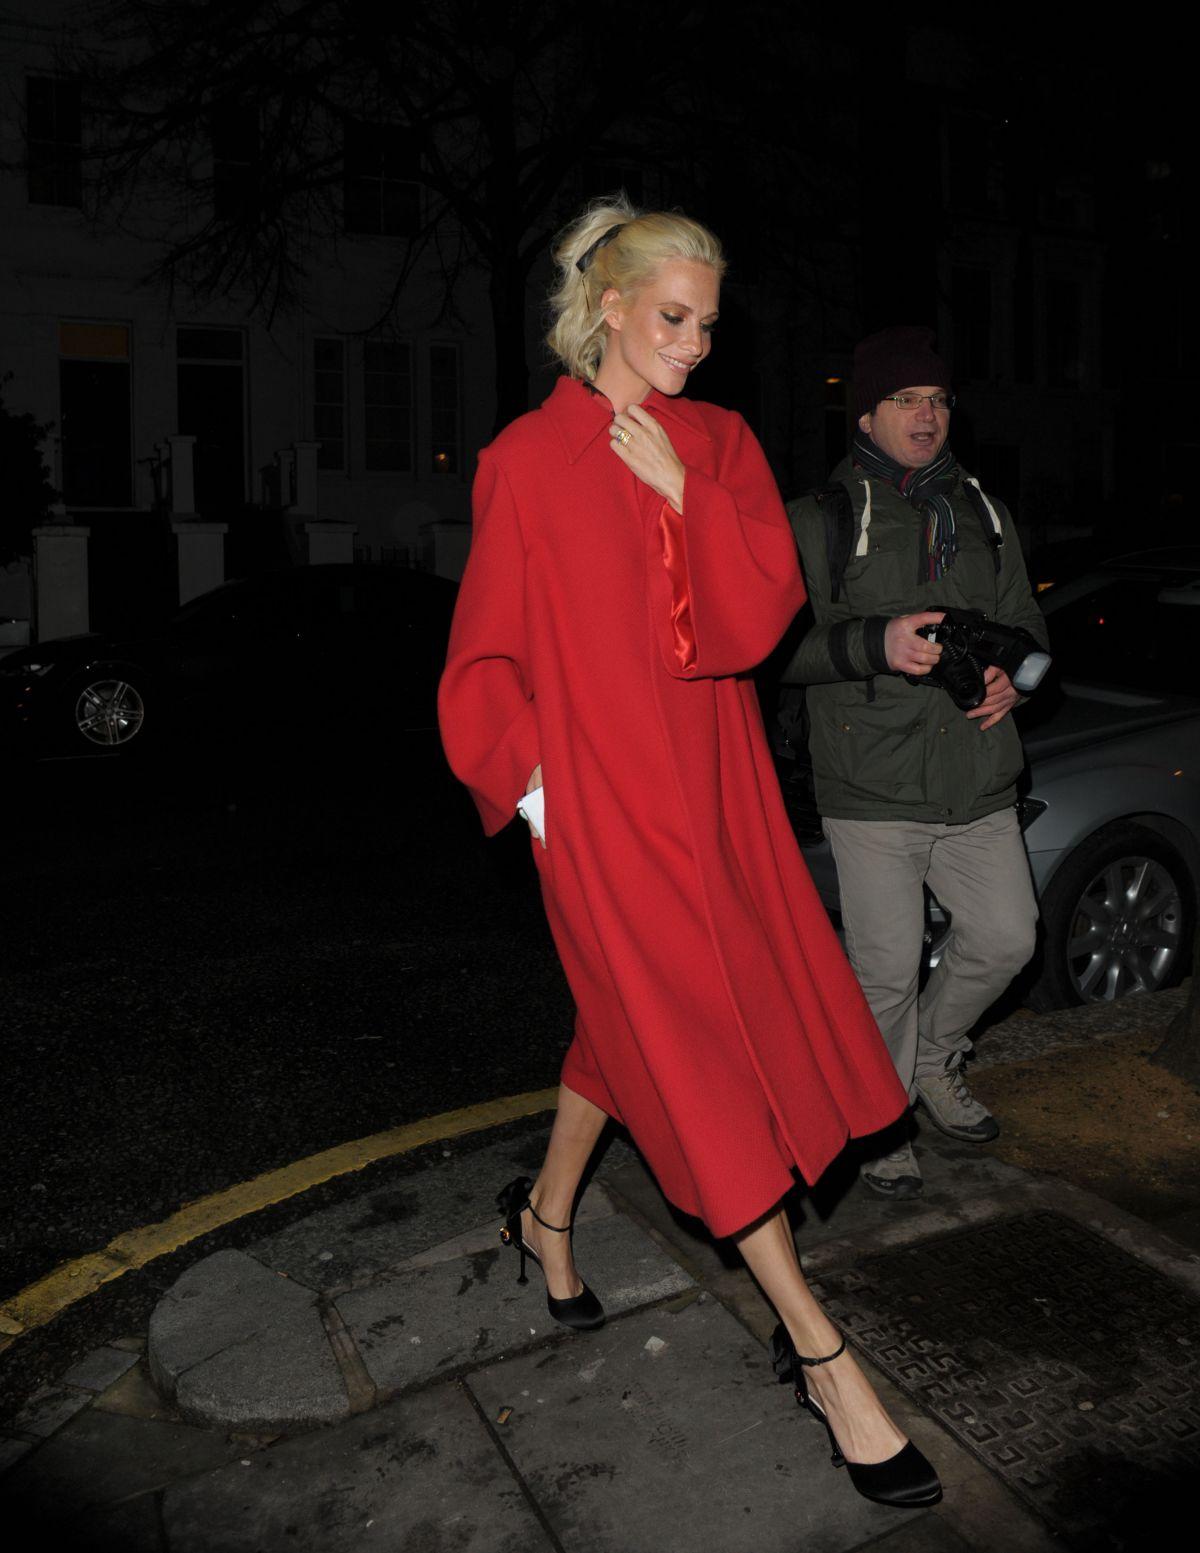 POPPY DELEVINGNE Arrives at Rodial VIP Dinner in London 01/16/2017